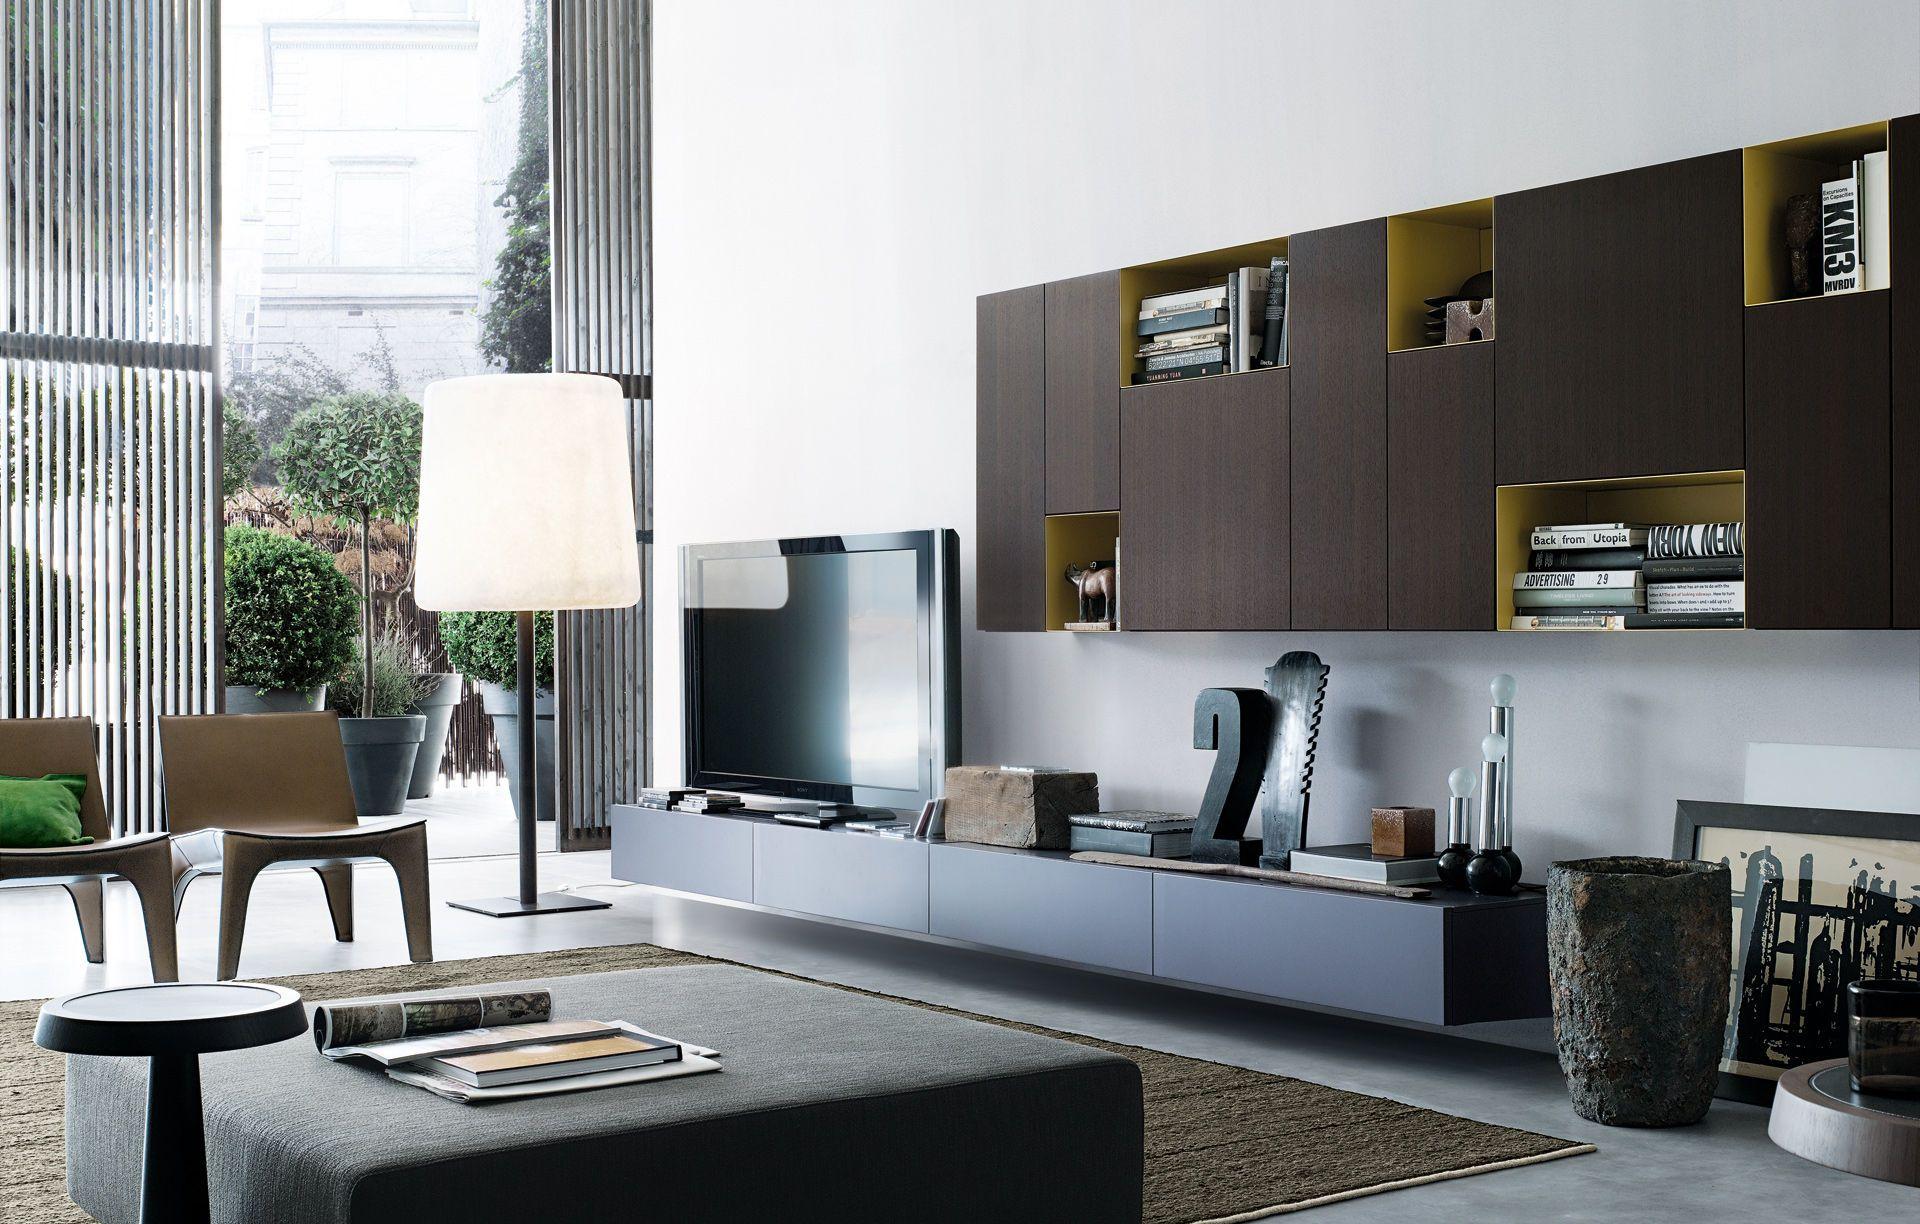 contemporary tv wall unit  sintesi by carlo colombo  poliform  - contemporary tv wall unit  sintesi by carlo colombo  poliform